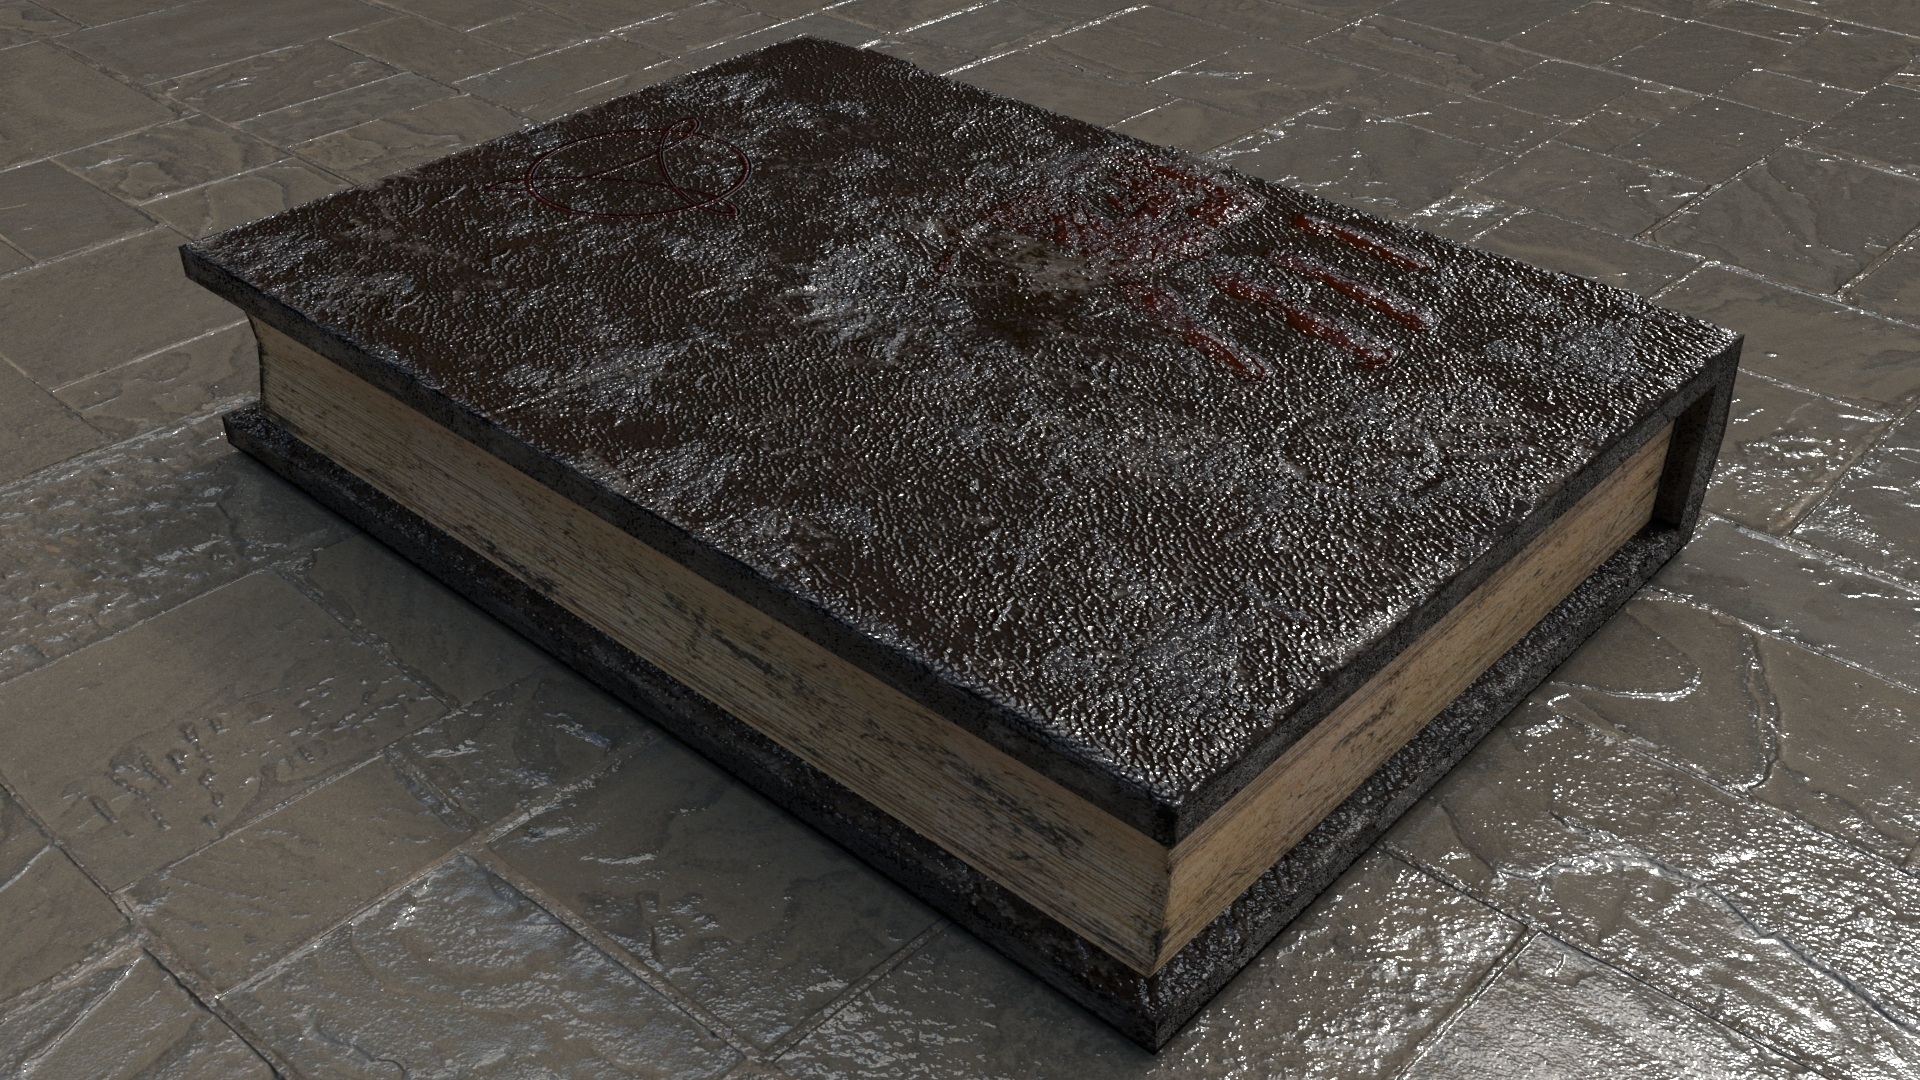 Book 6.jpg Download STL file Old Book • Template to 3D print, Mokun